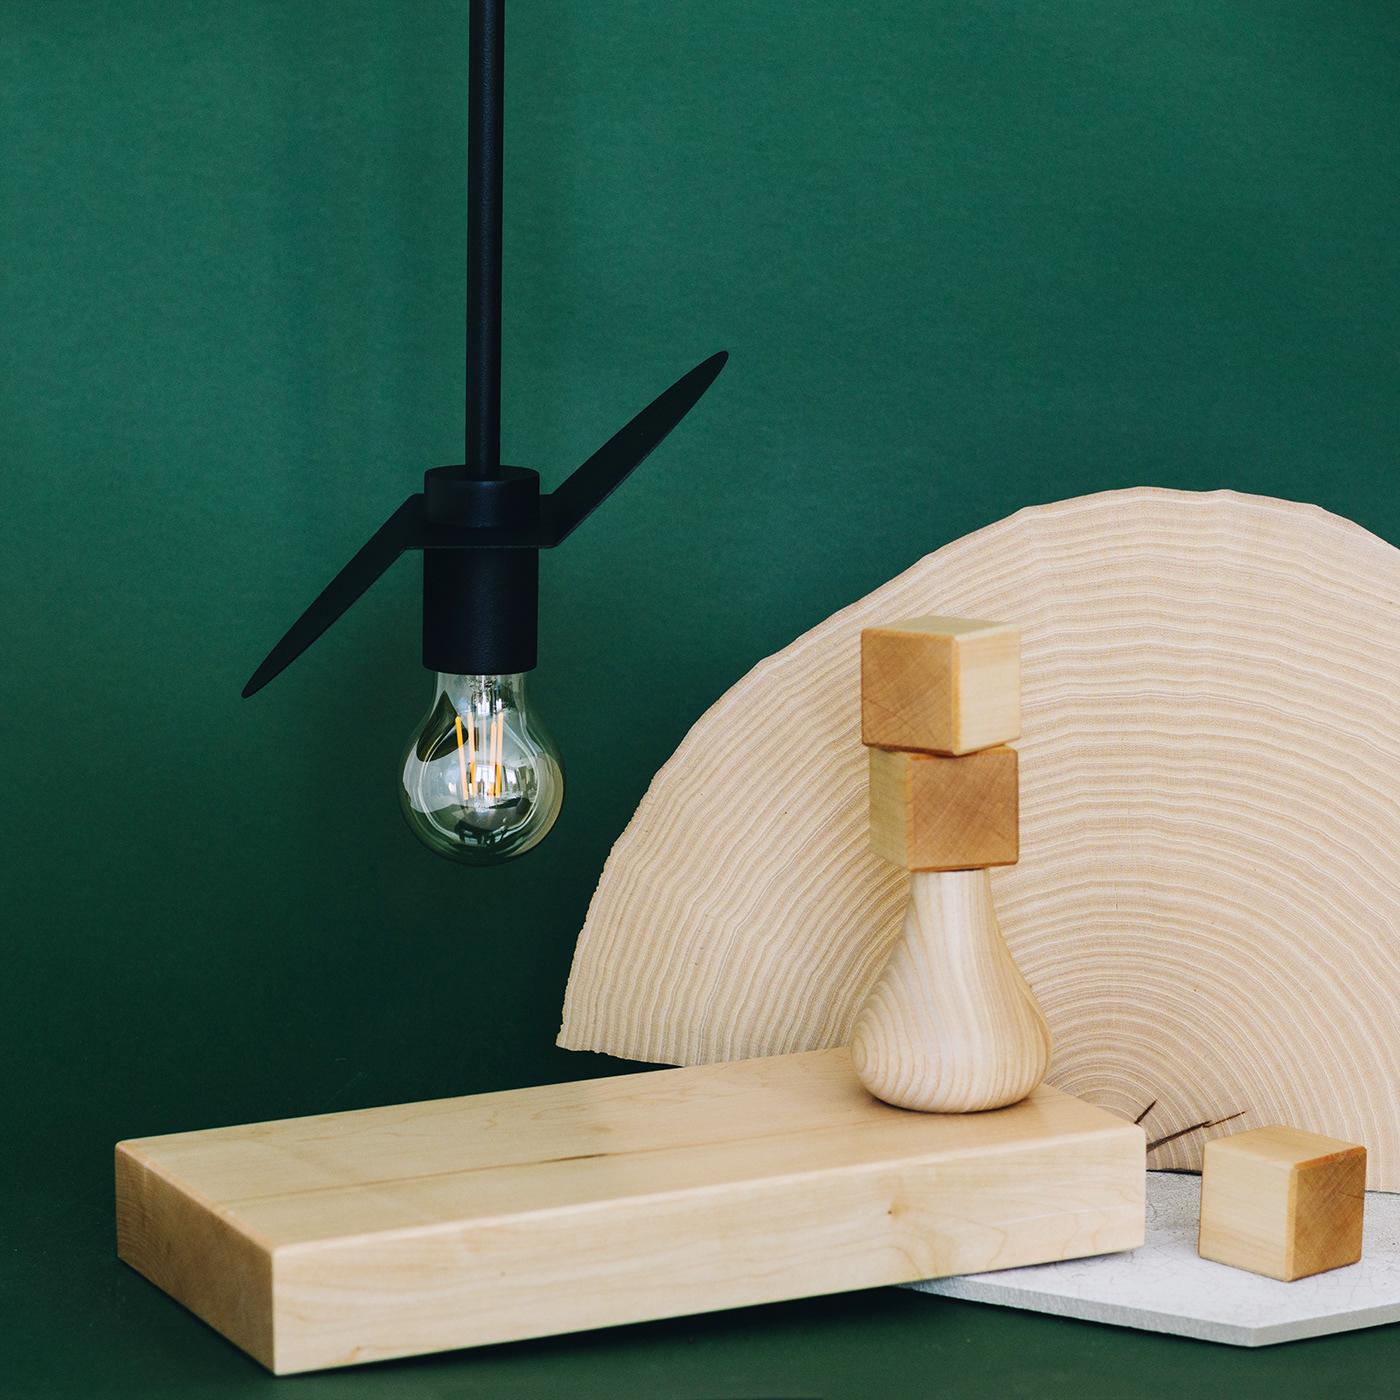 decor Interior interiordesign KononenkoID Lamp light lightroom minimalizm pendant ukraine